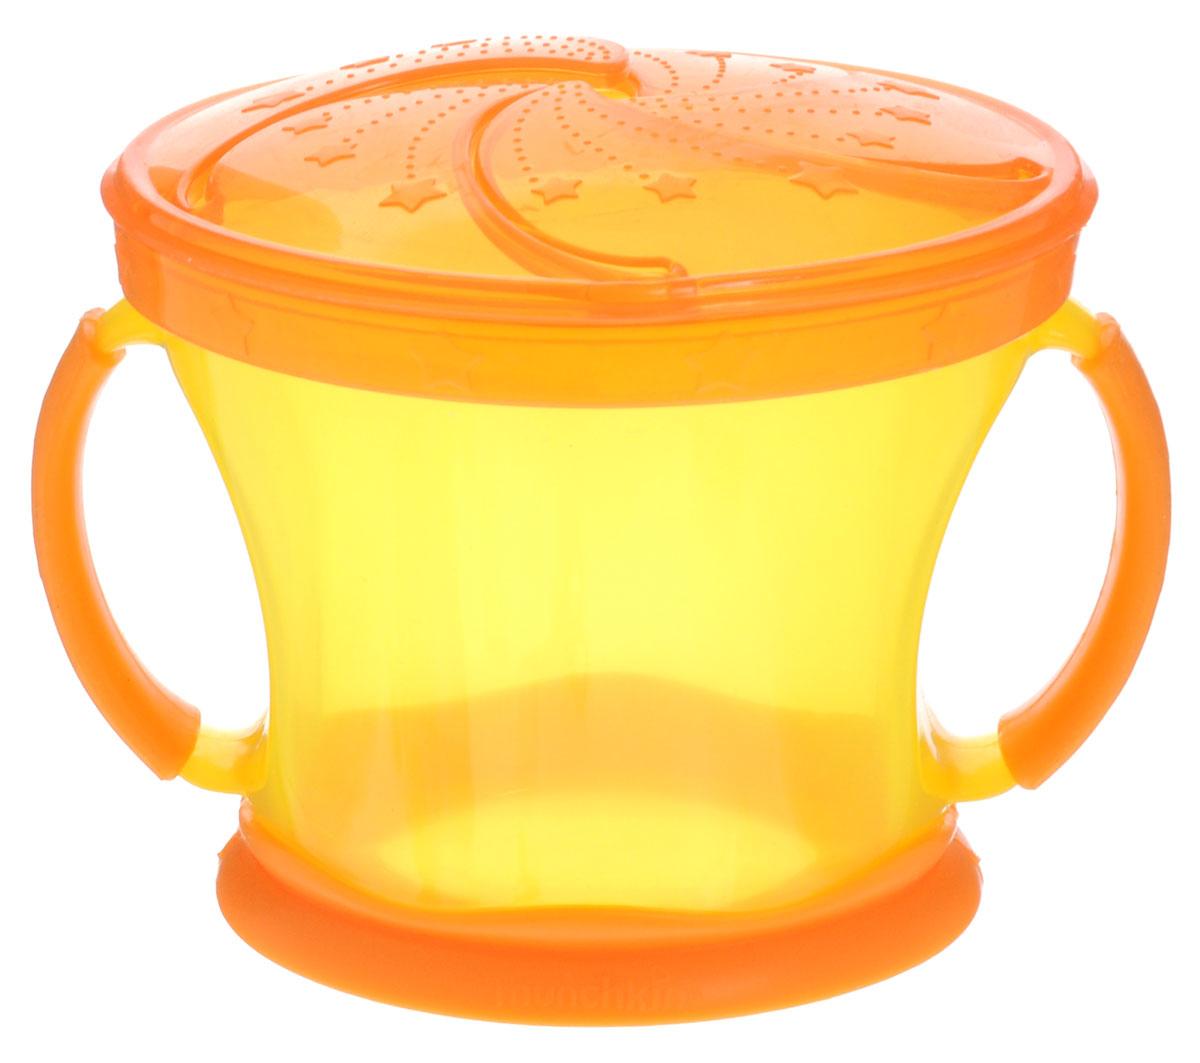 Munchkin Контейнер Поймай печенье, цвет: желтый, оранжевый